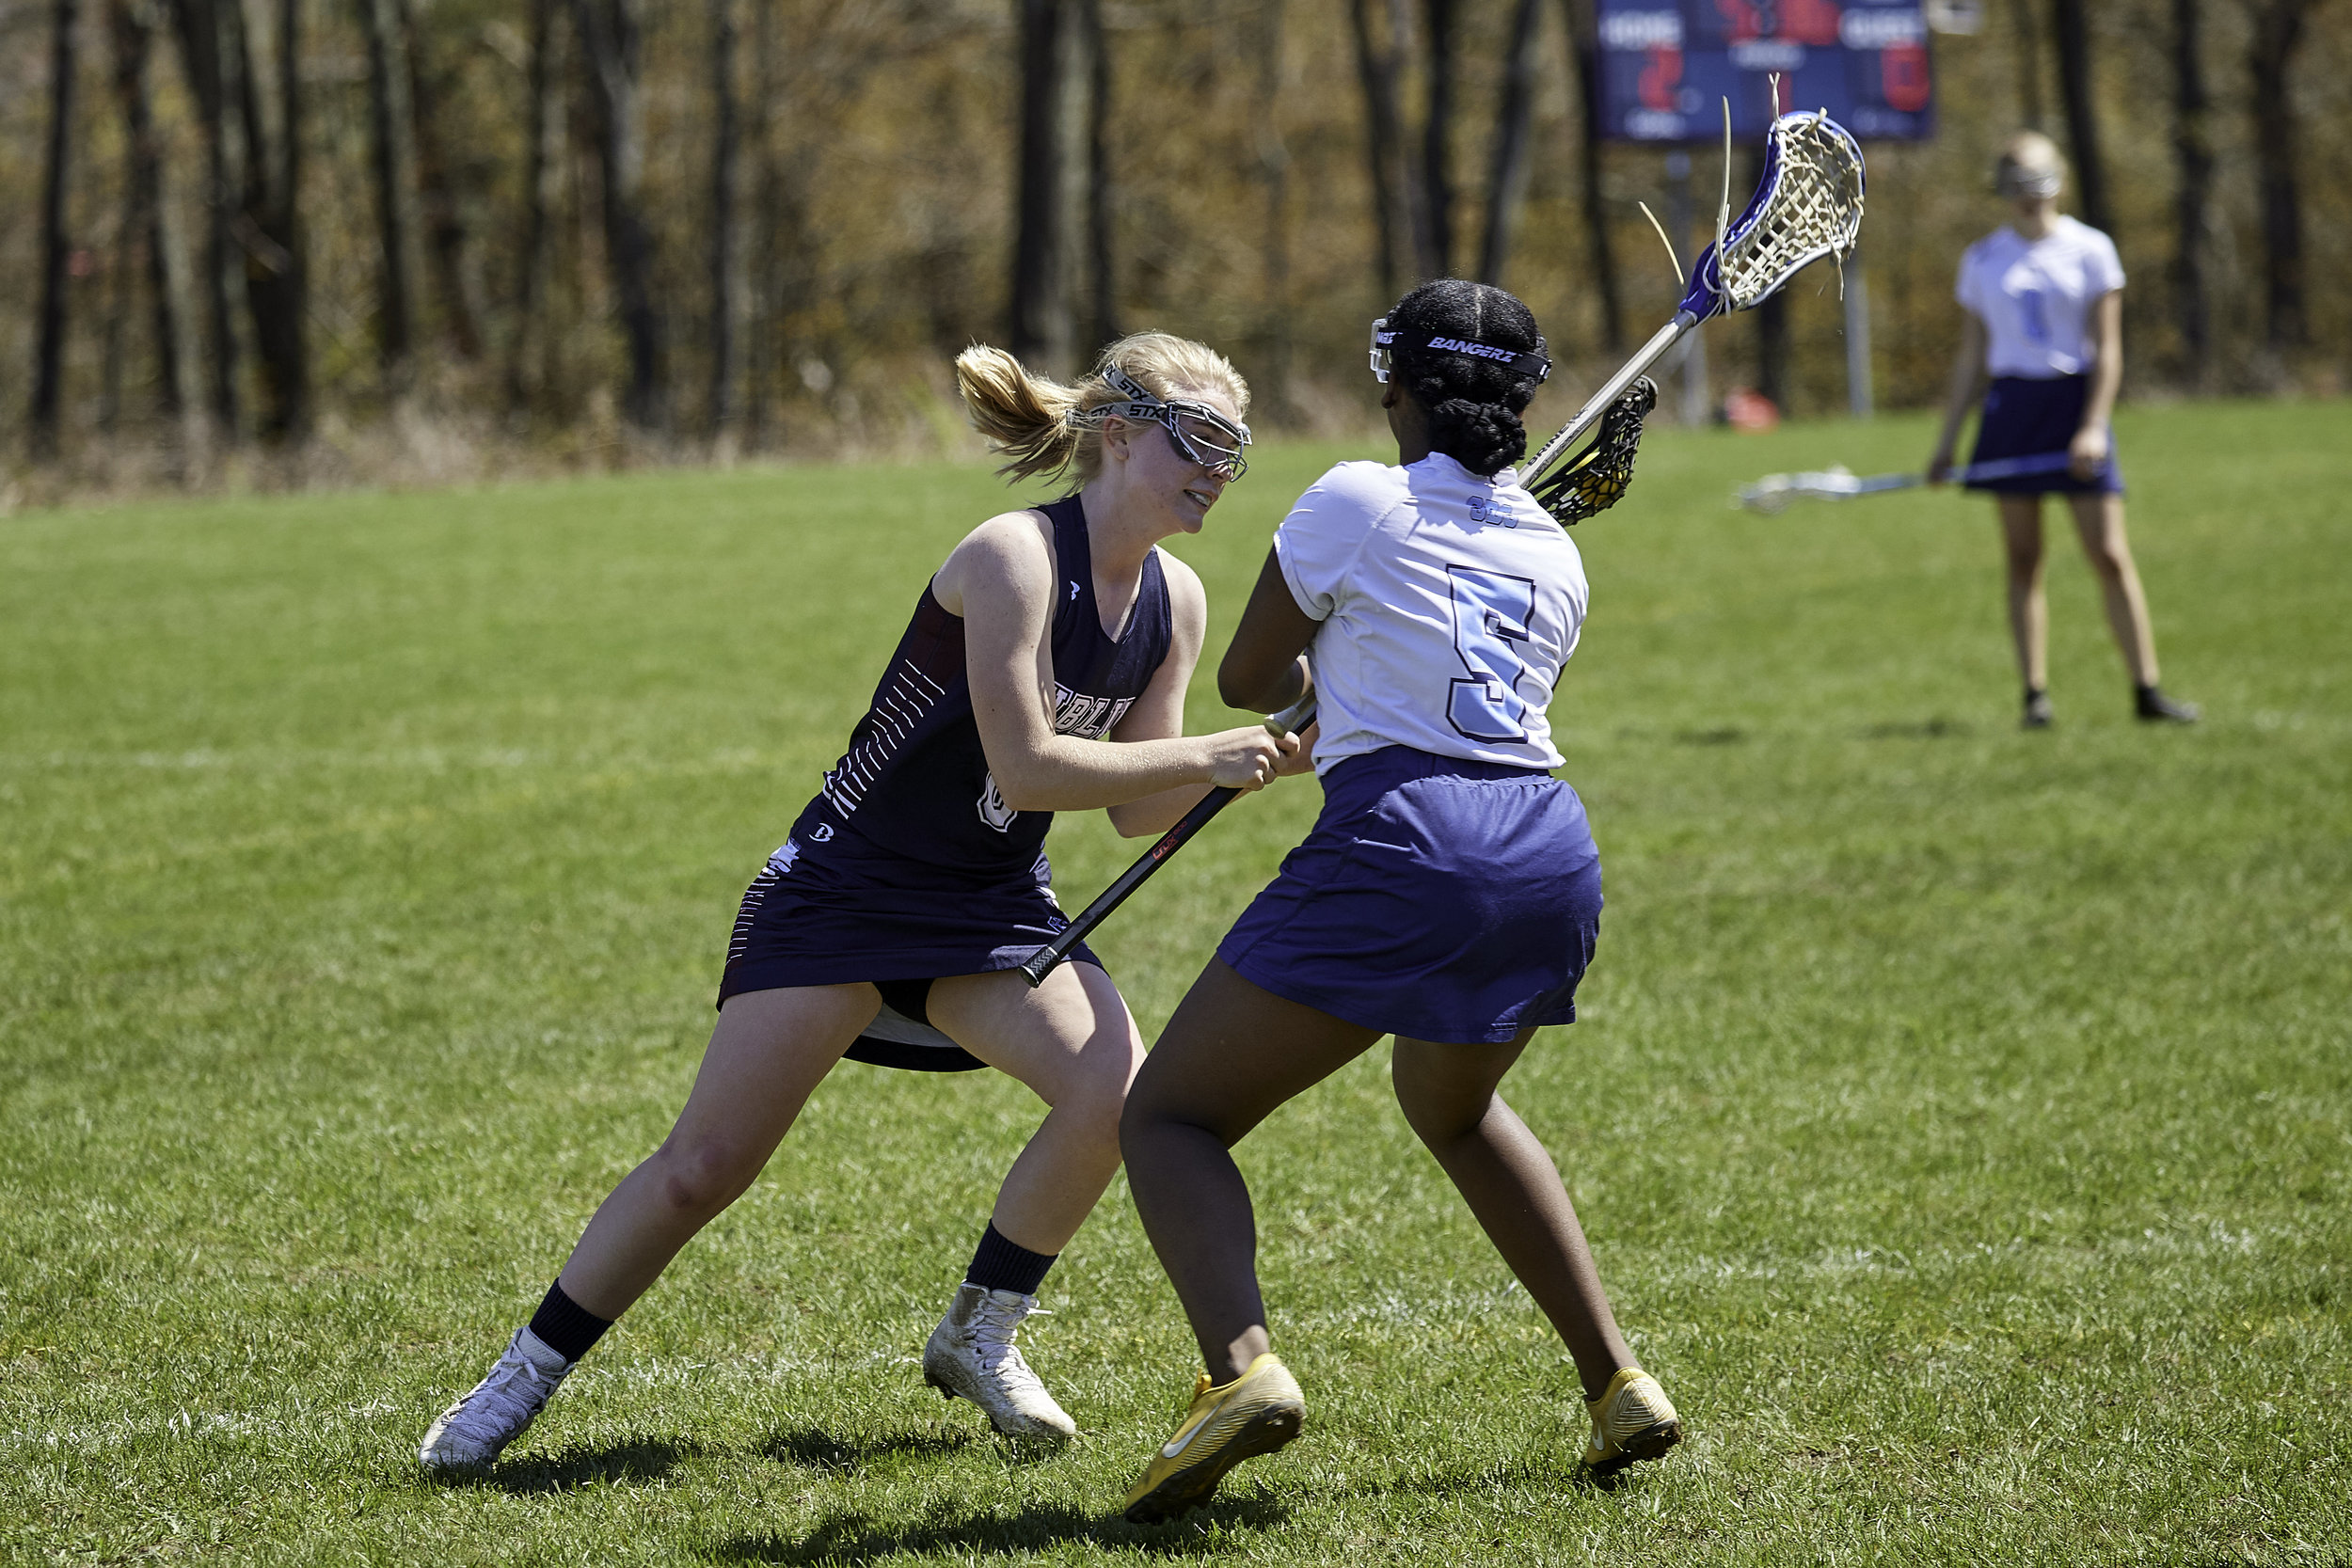 Girls Lacrosse vs. Stoneleigh Burnham School - May 11, 2019 - May 10, 2019193246.jpg